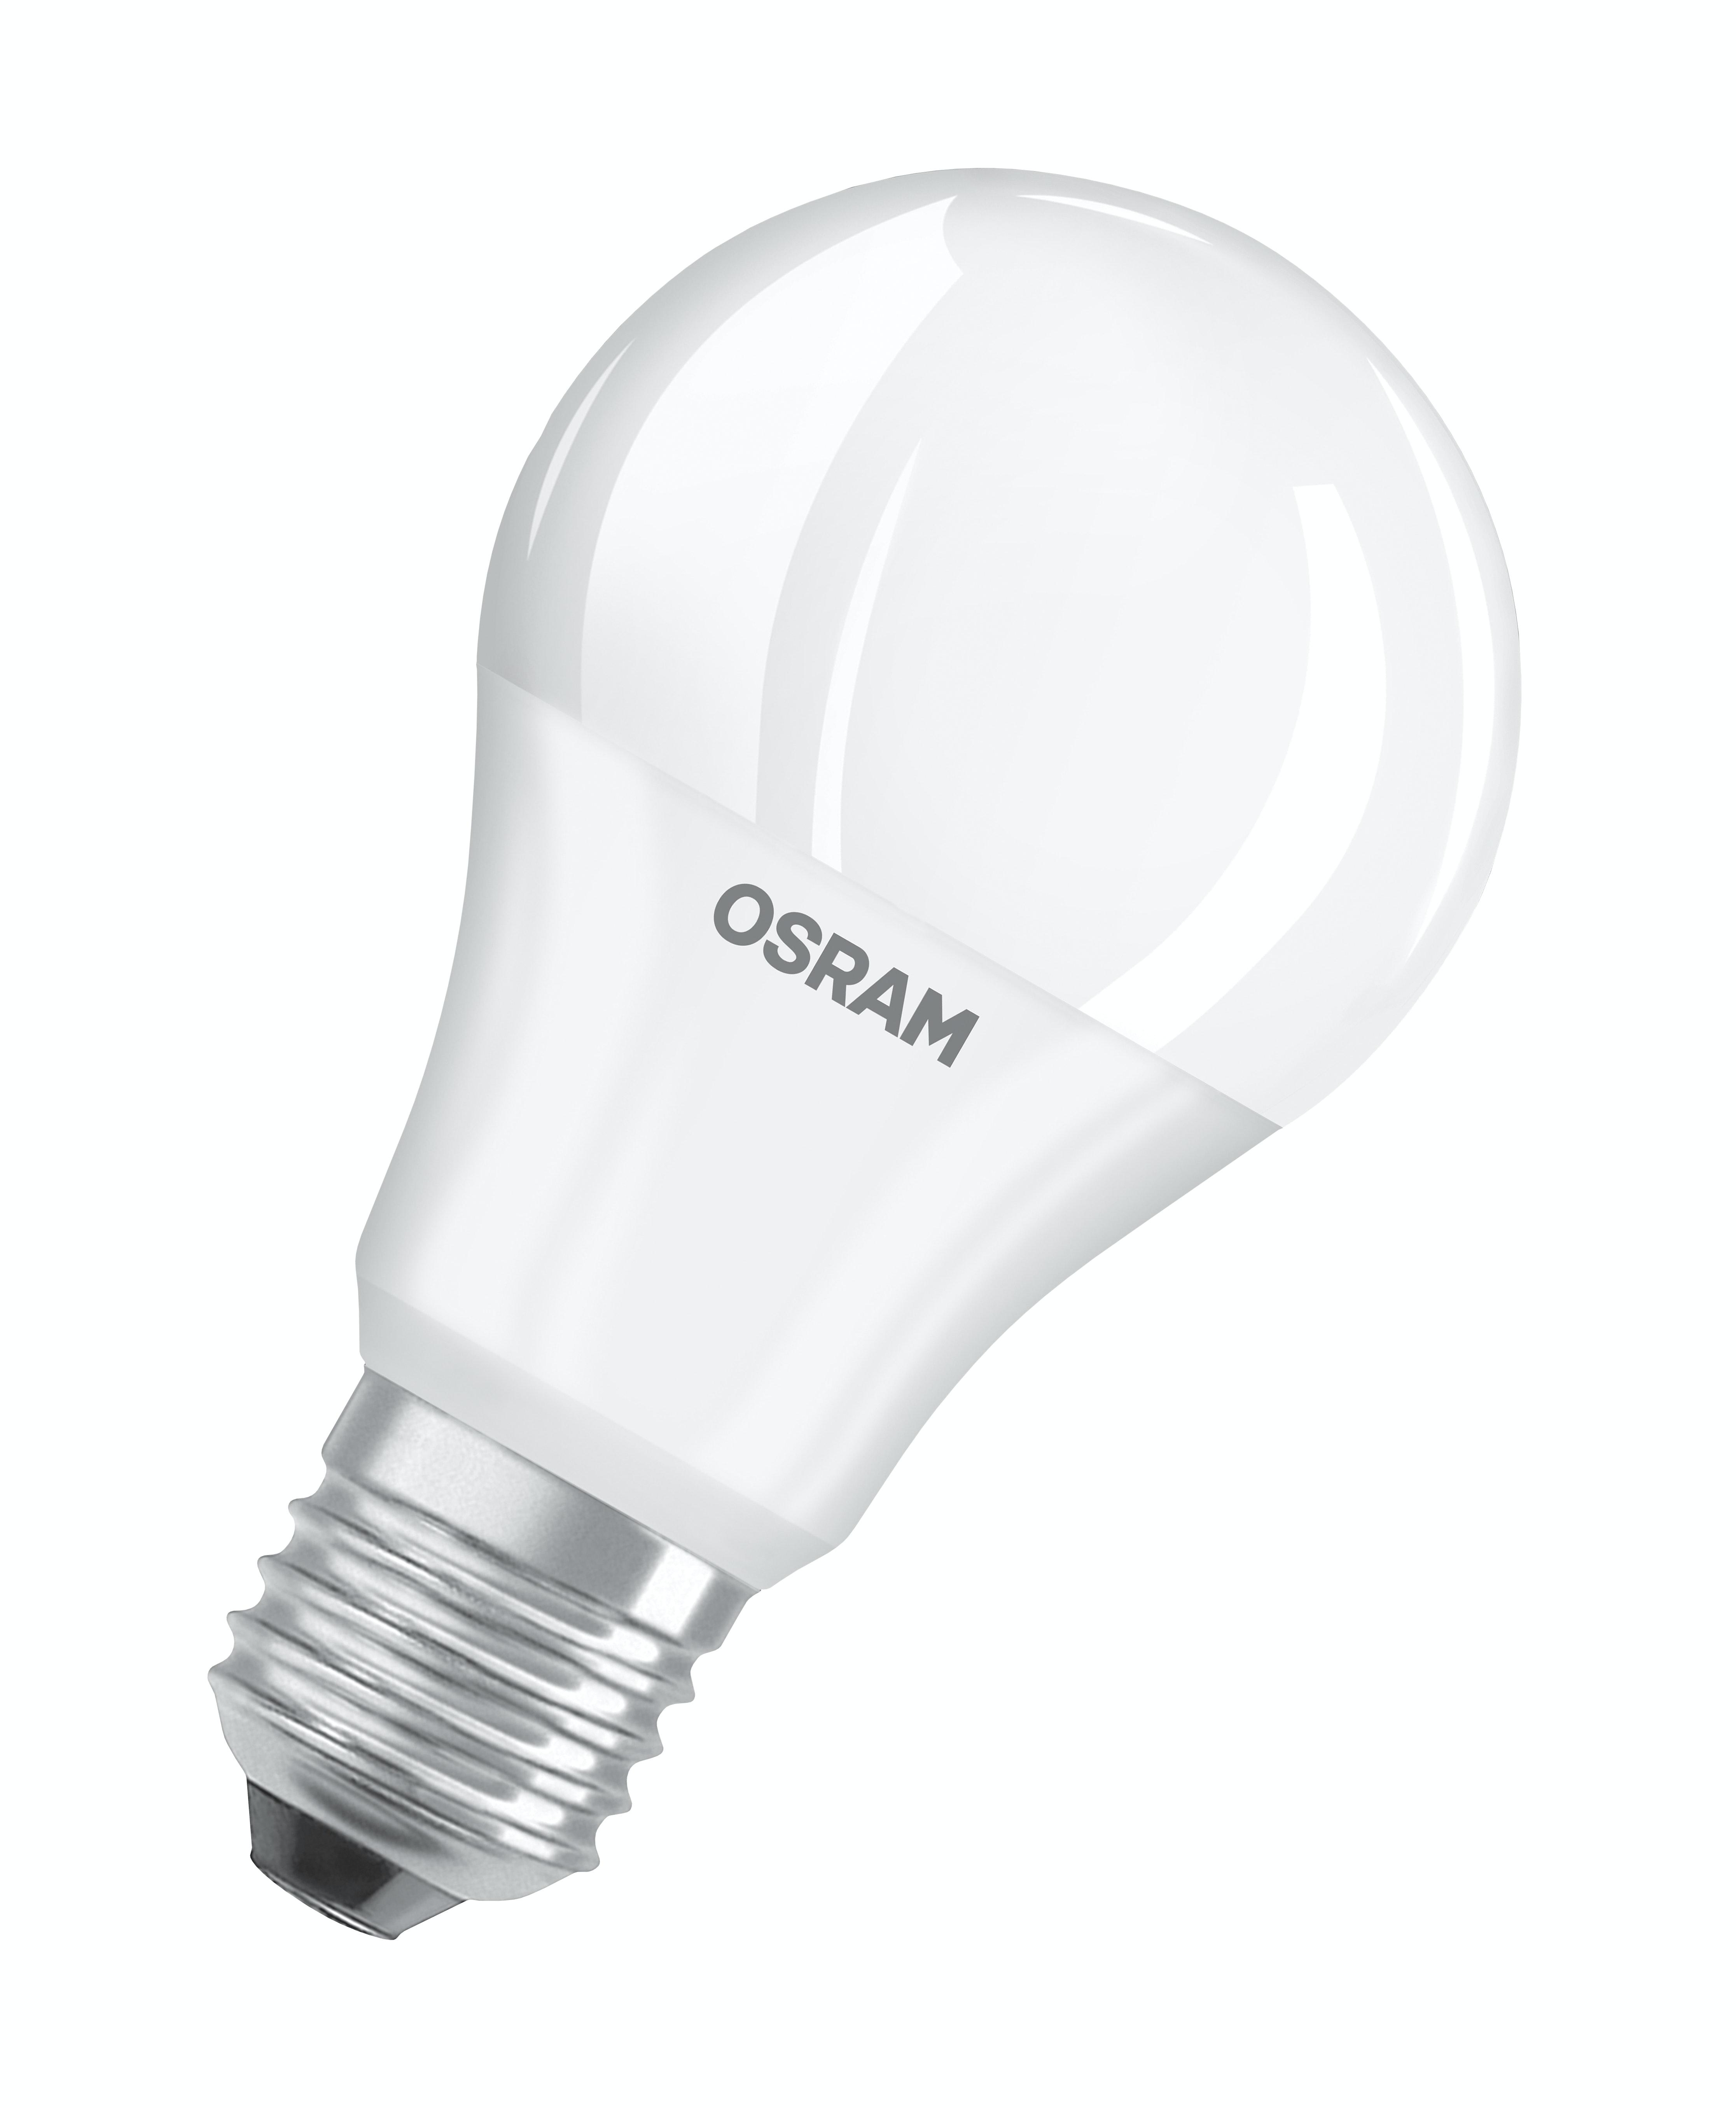 Led-lampa Osram SST D Clickdim CLA60 Normal E27 8,5W